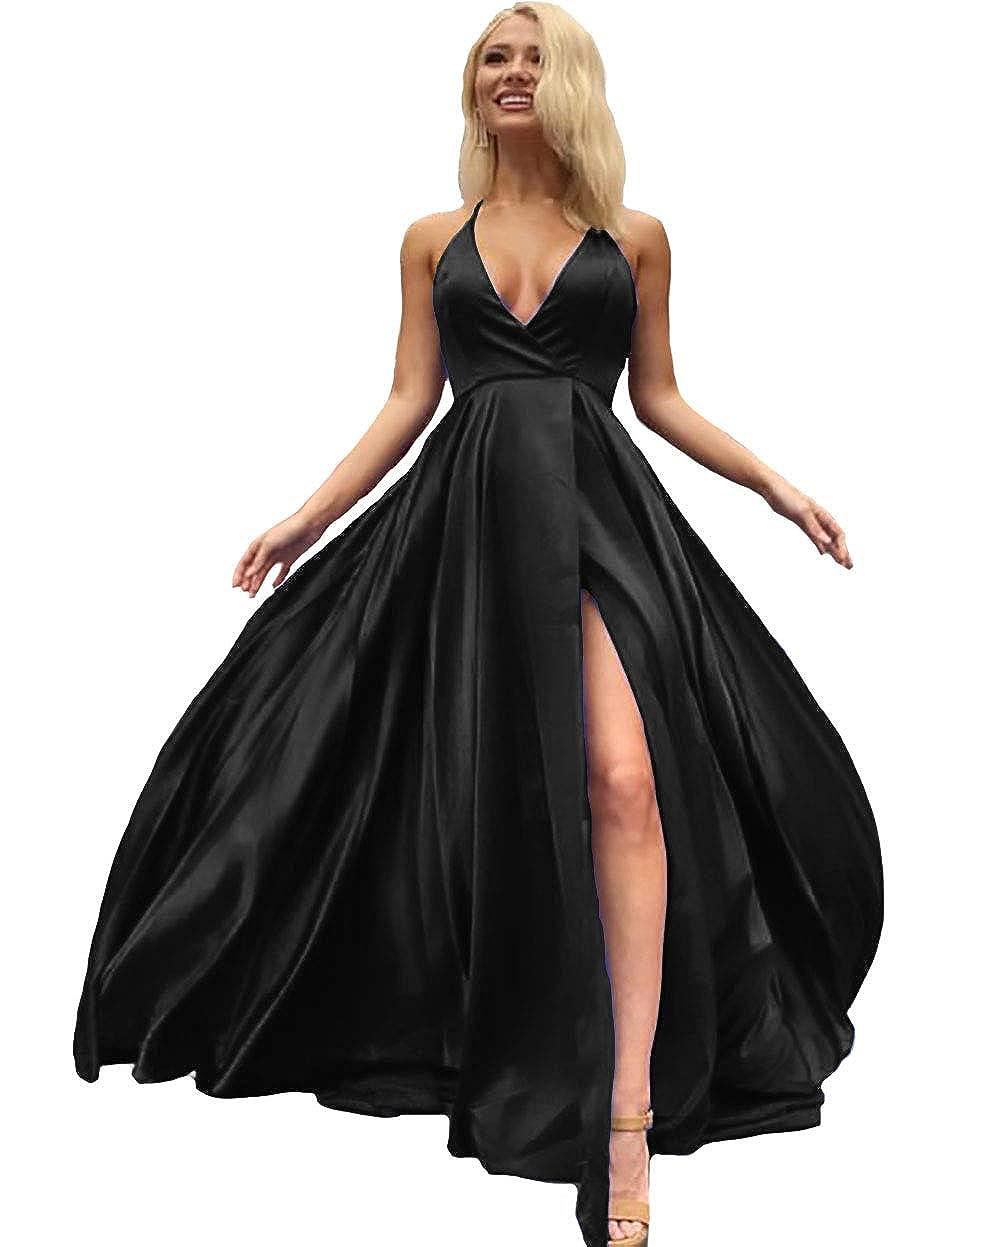 Black IVYPRECIOUS V Neck Side Split Prom Dresses A Line Long Evening Gowns for Women